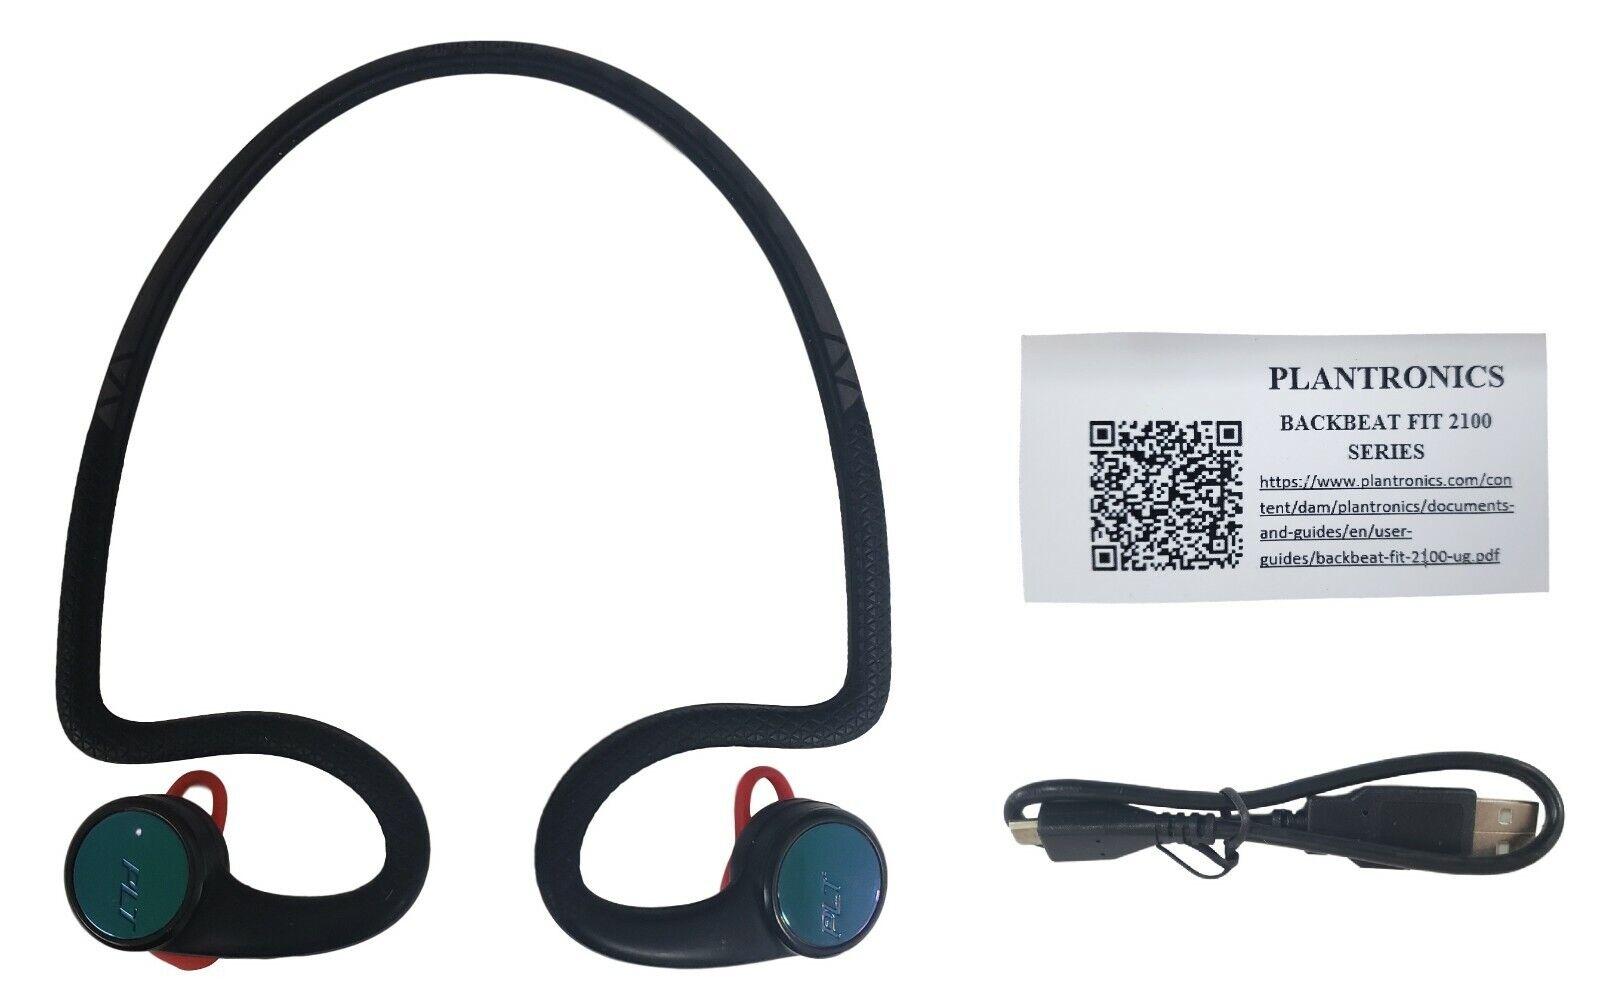 Plantronics Backbeat Fit Stereo Wireless Bluetooth Headphones For Sale Online Ebay